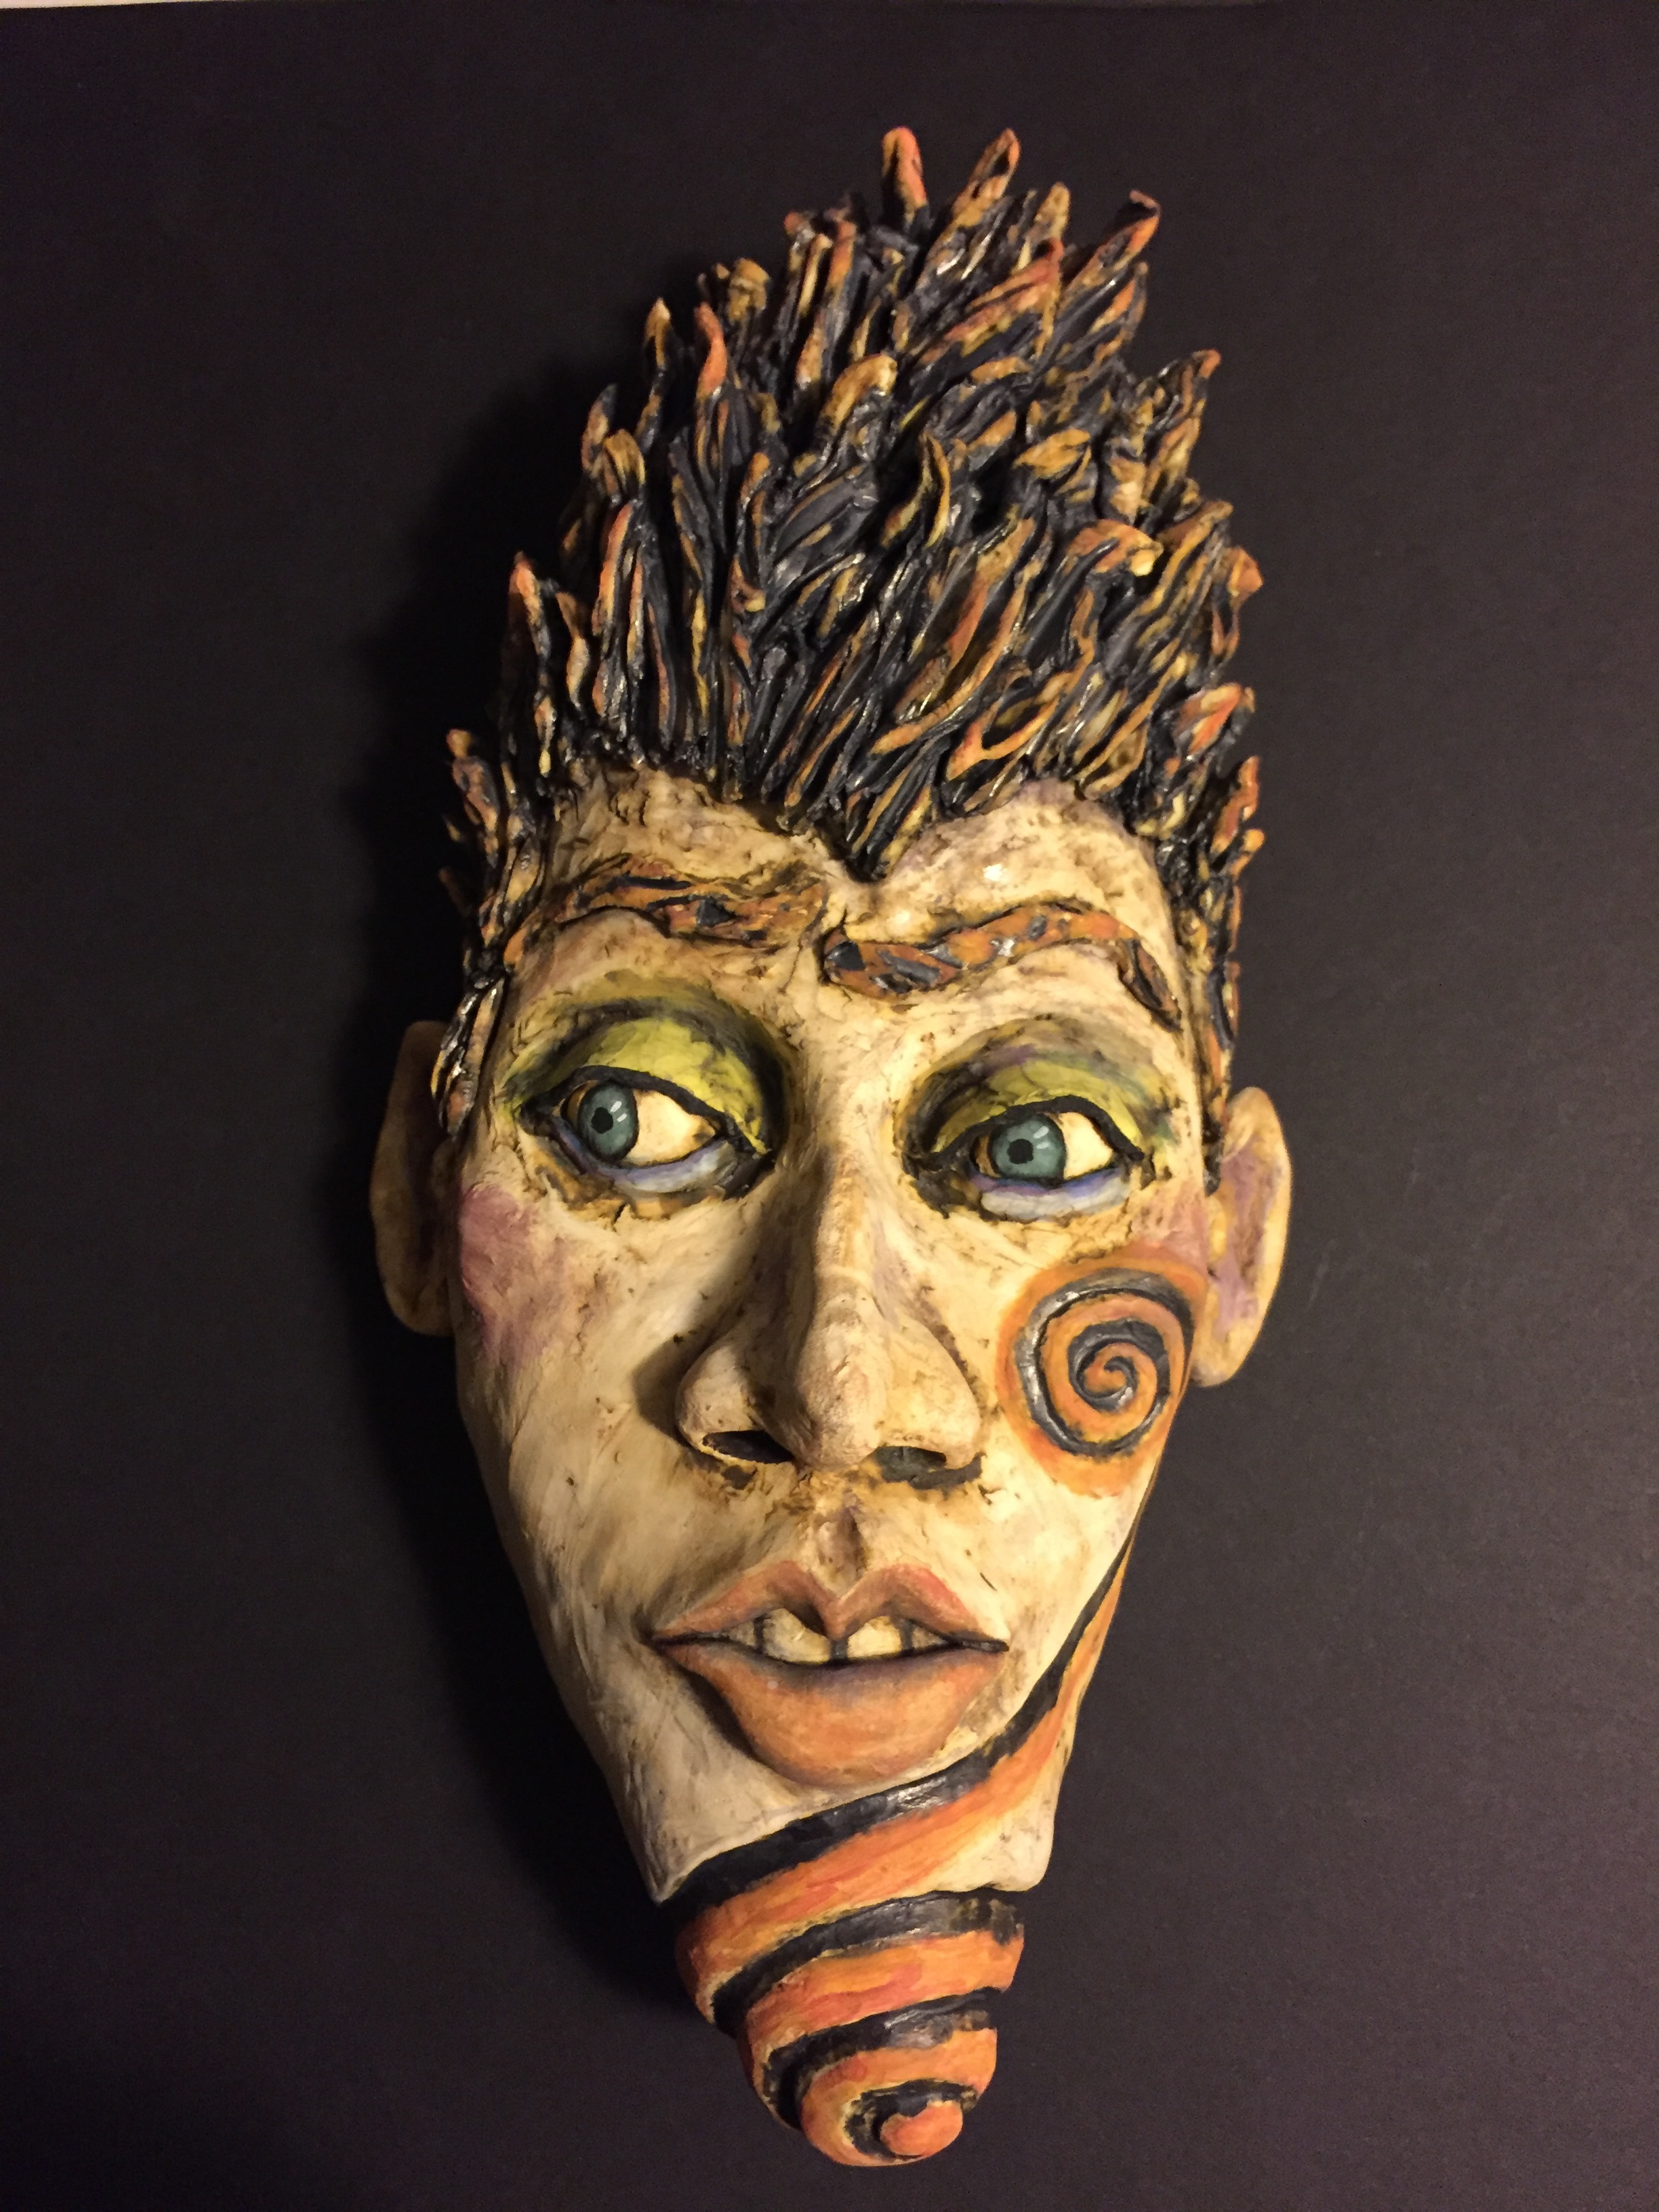 Ceramic Mask by flo fahrenheit